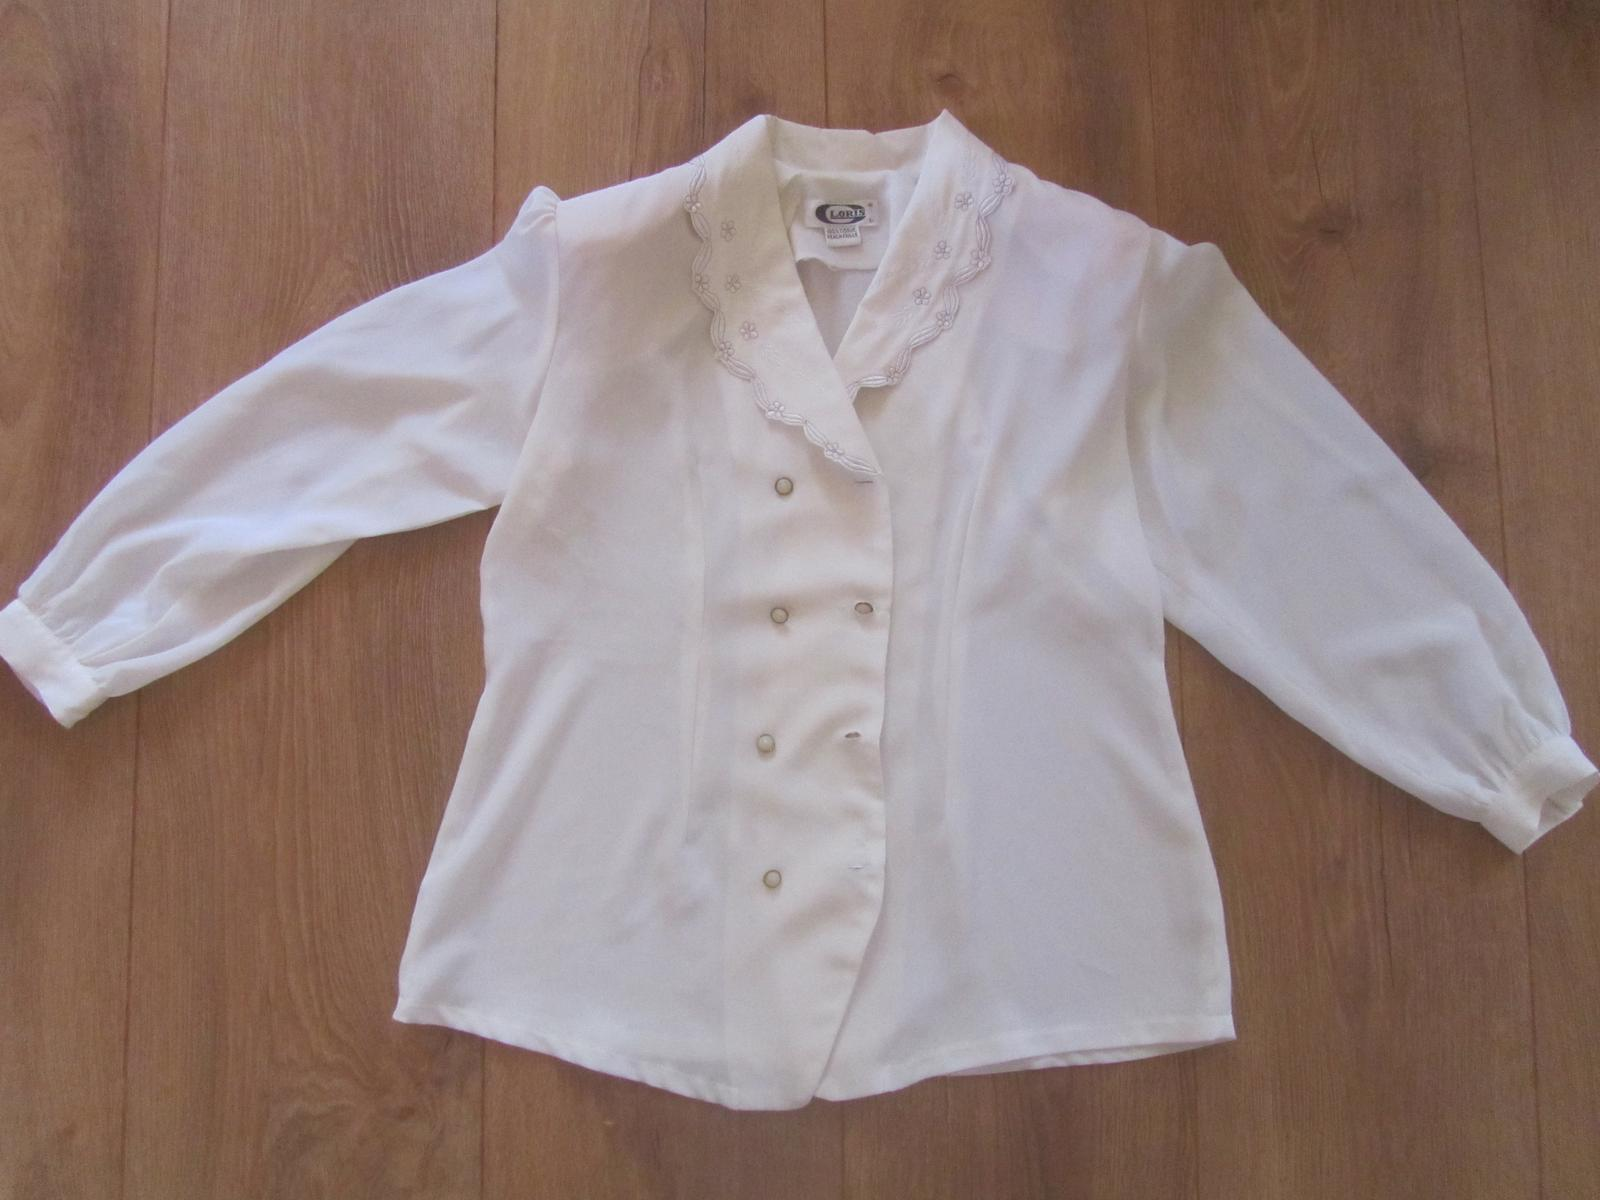 Biela bluzka s vysivanym golierom L - Obrázok č. 1